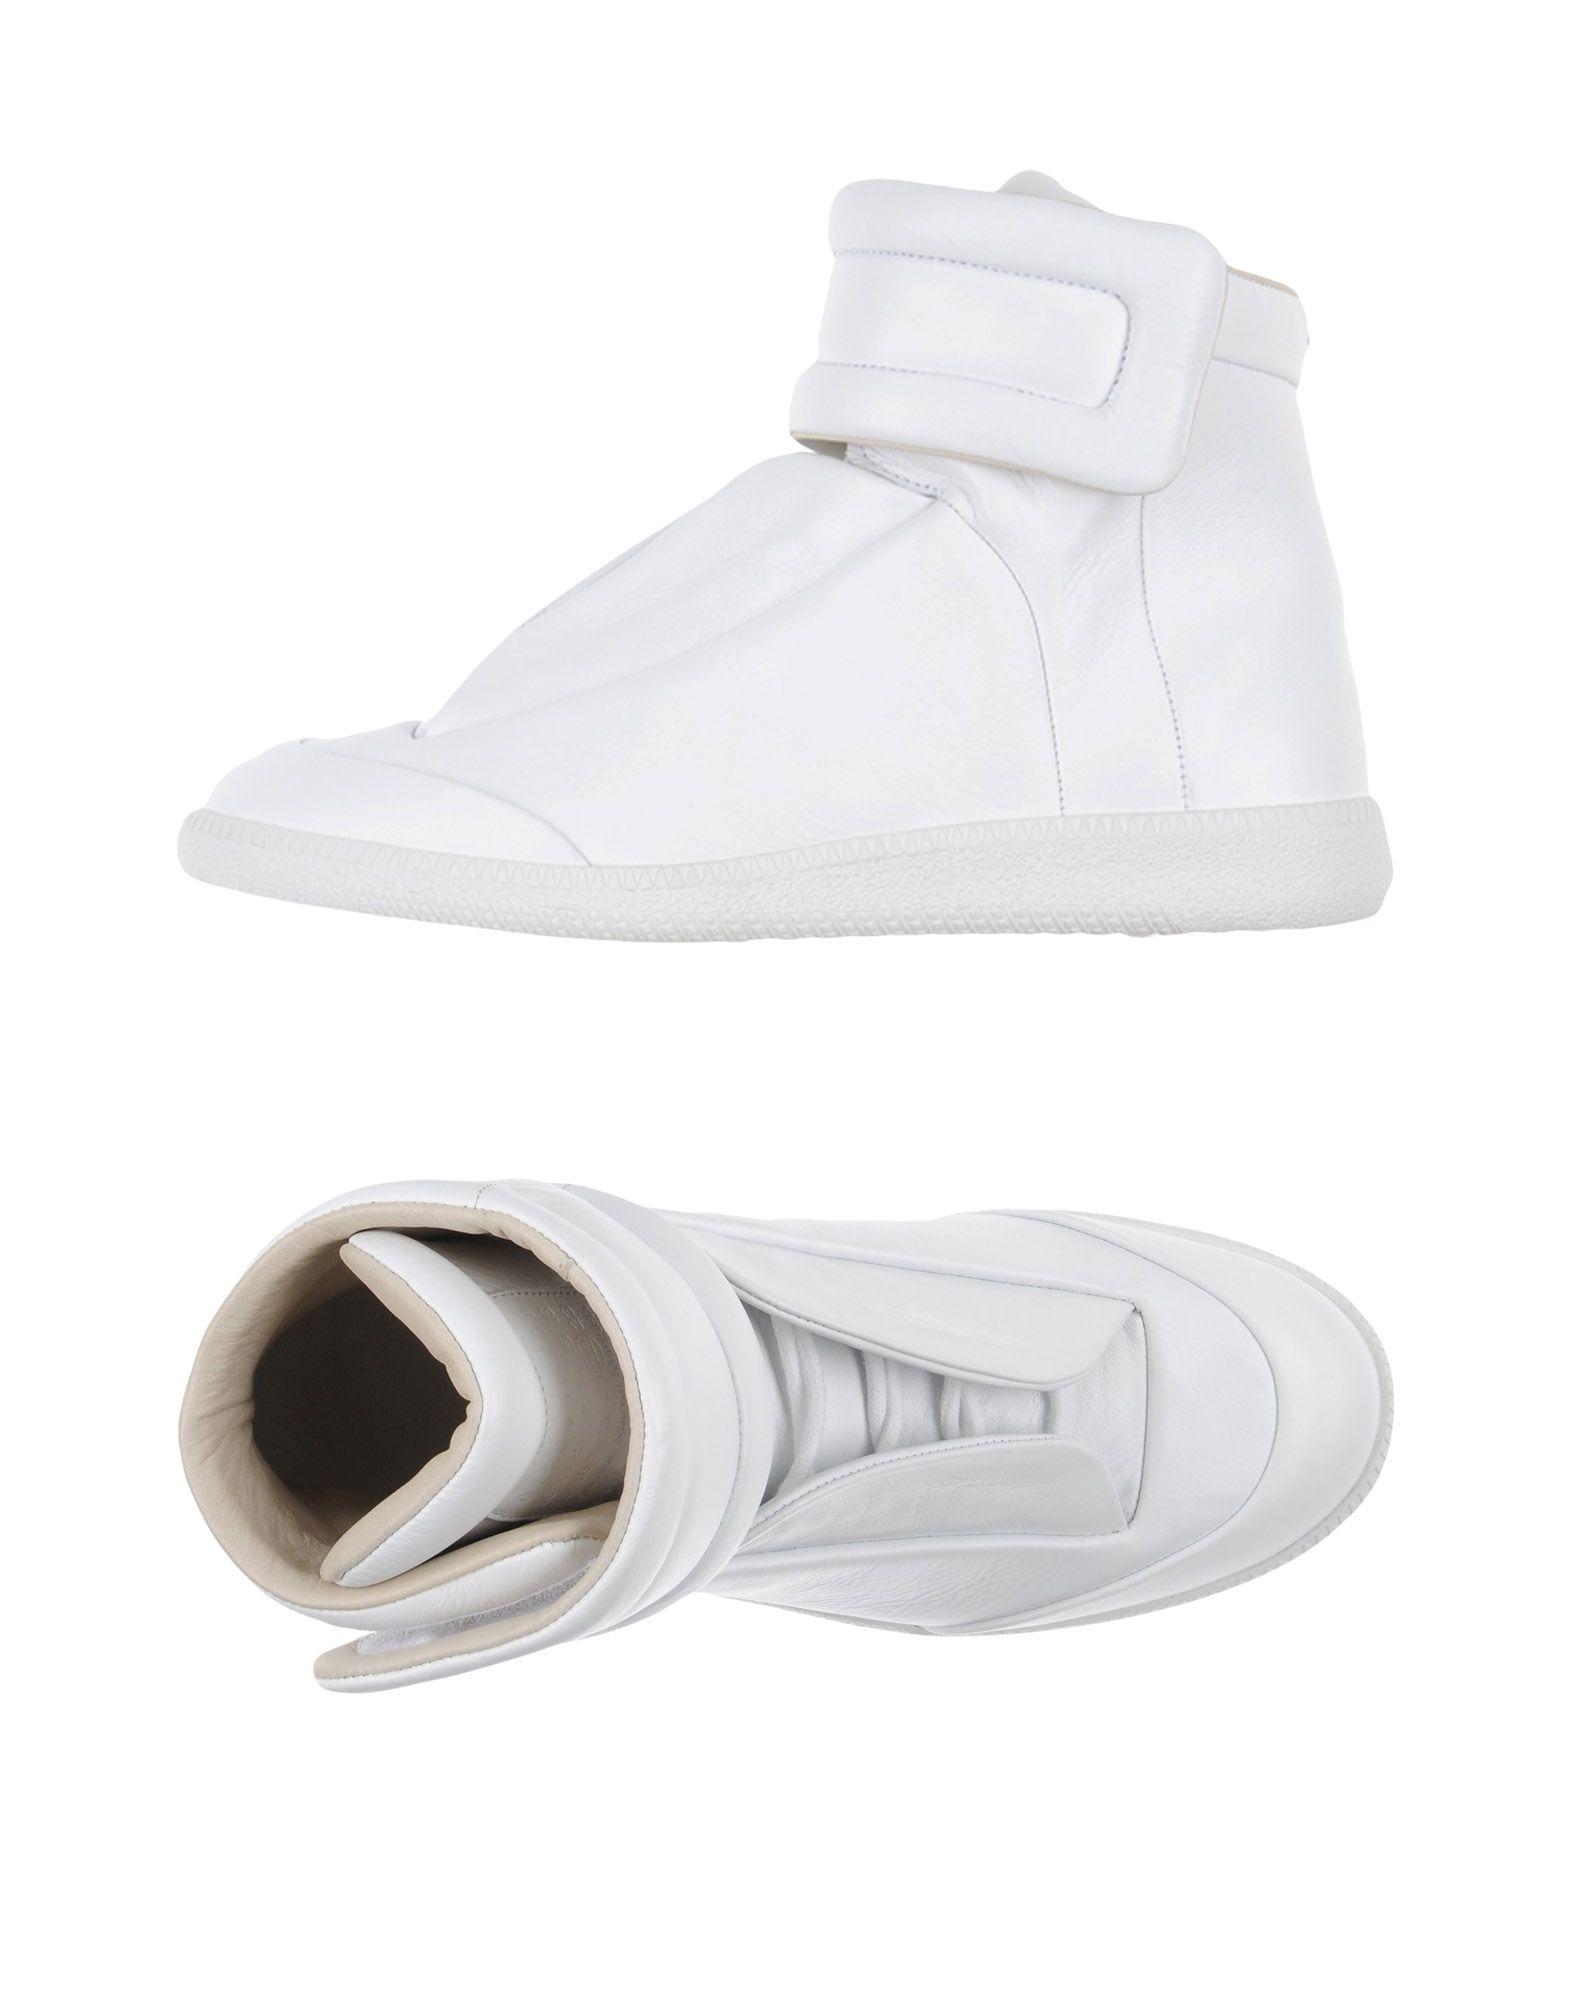 Maison Margiela Sneakers - Women Maison  Margiela Sneakers online on  Maison United Kingdom - 11265899KC c778dc